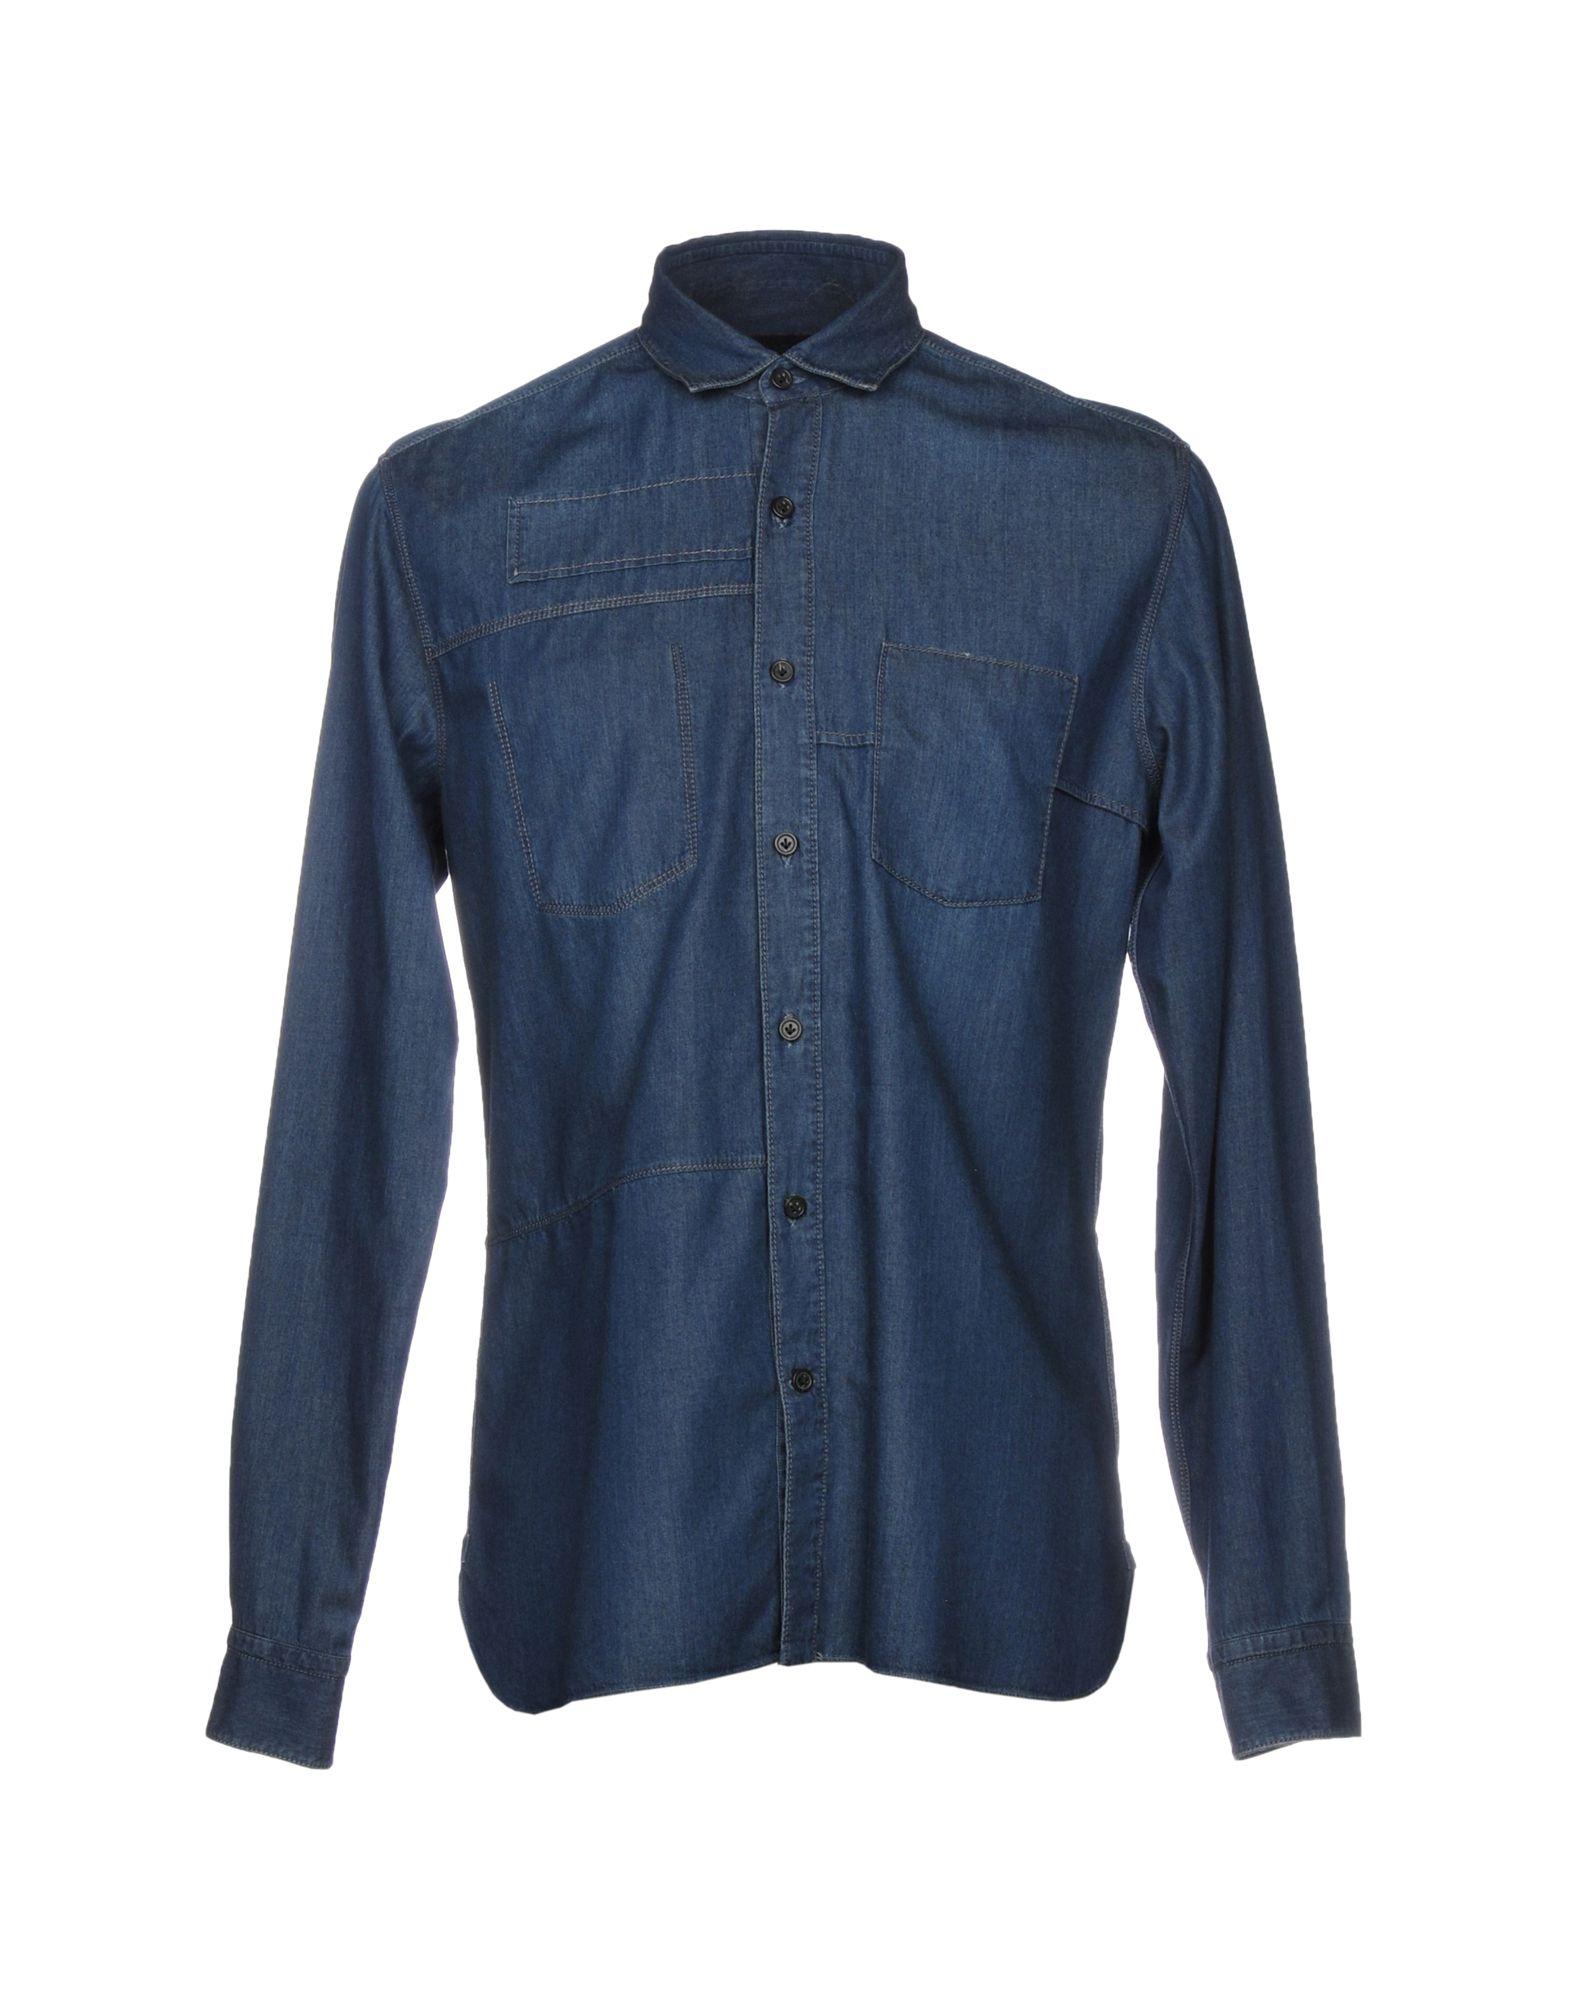 цена на LANVIN Джинсовая рубашка